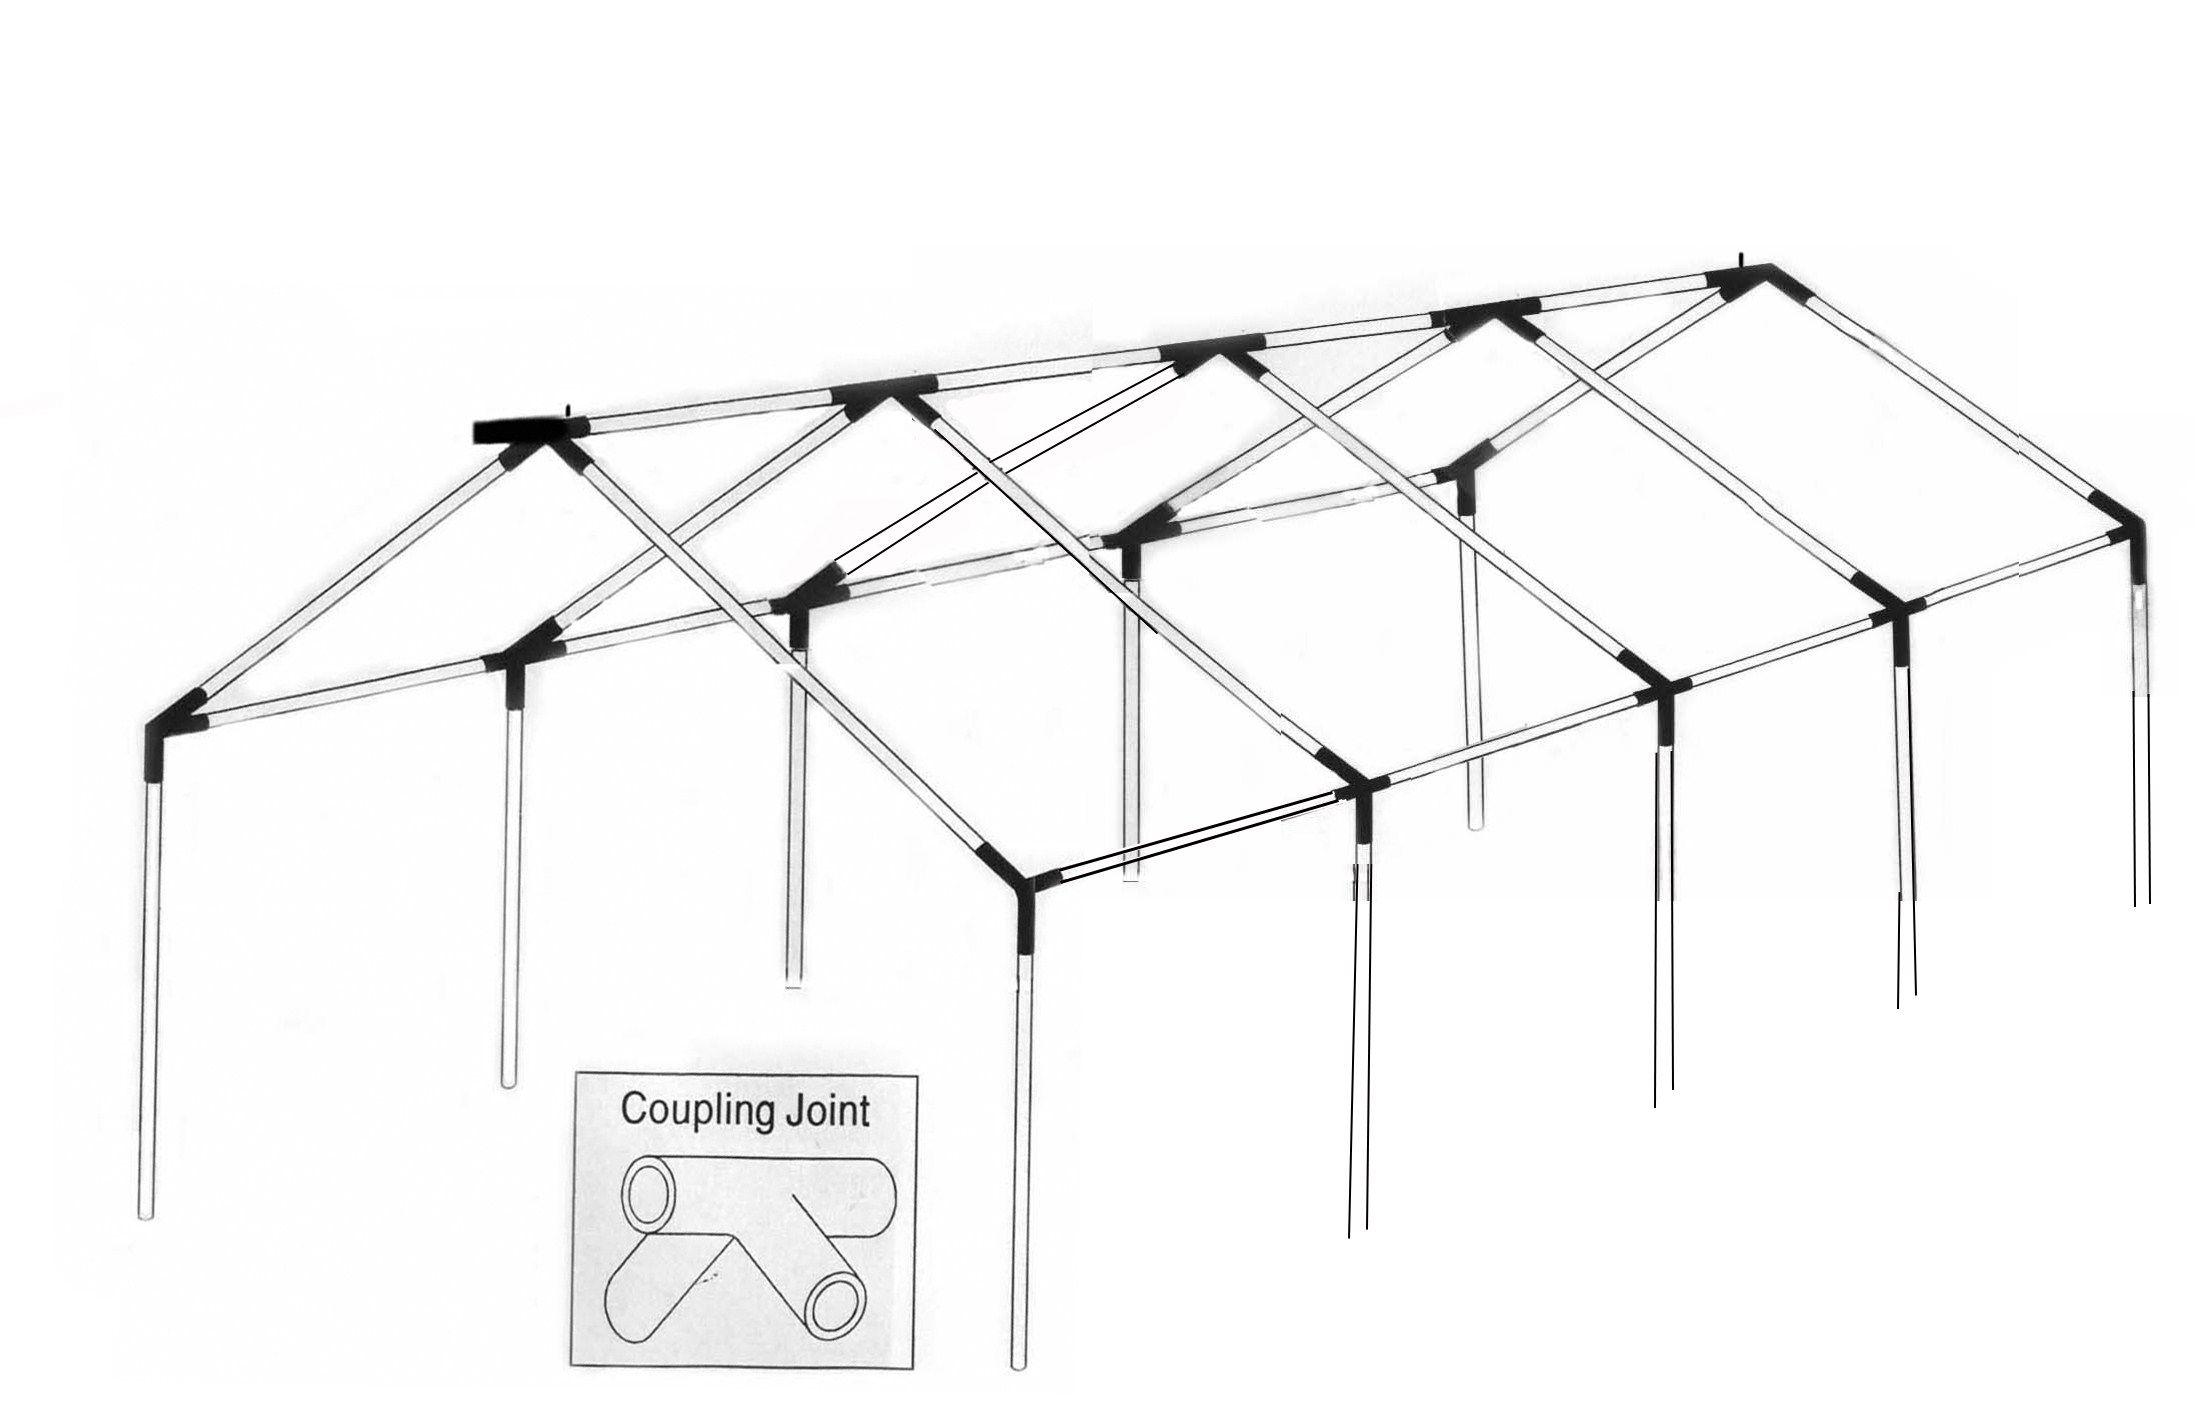 tent frame systems diy party tent diy wedding tent diy tent wedding wall [ 2201 x 1401 Pixel ]